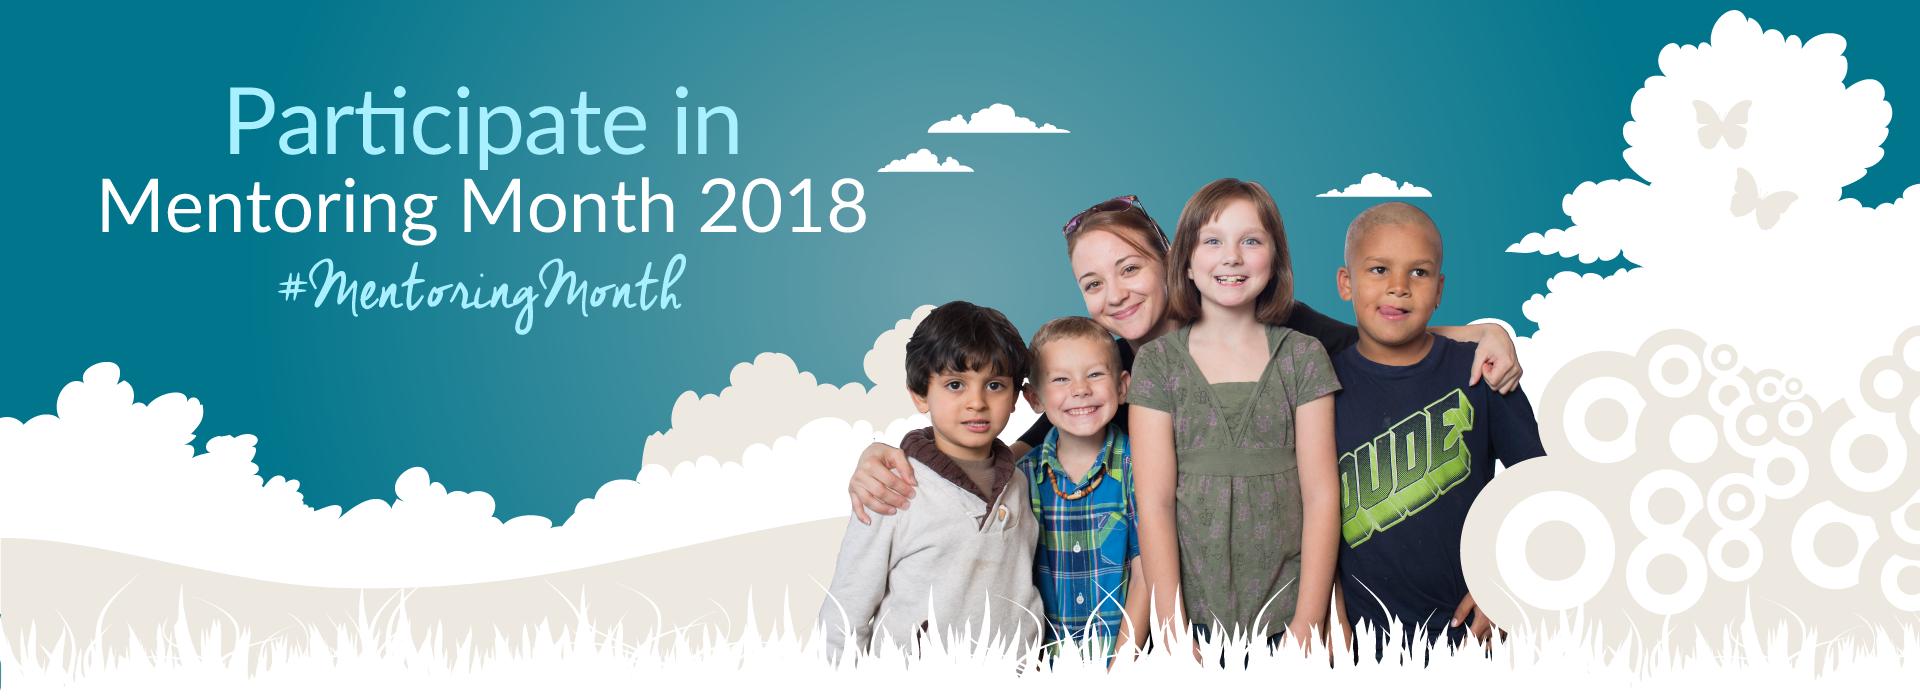 Mentoring Month 2018 MentoringMonth - Participate